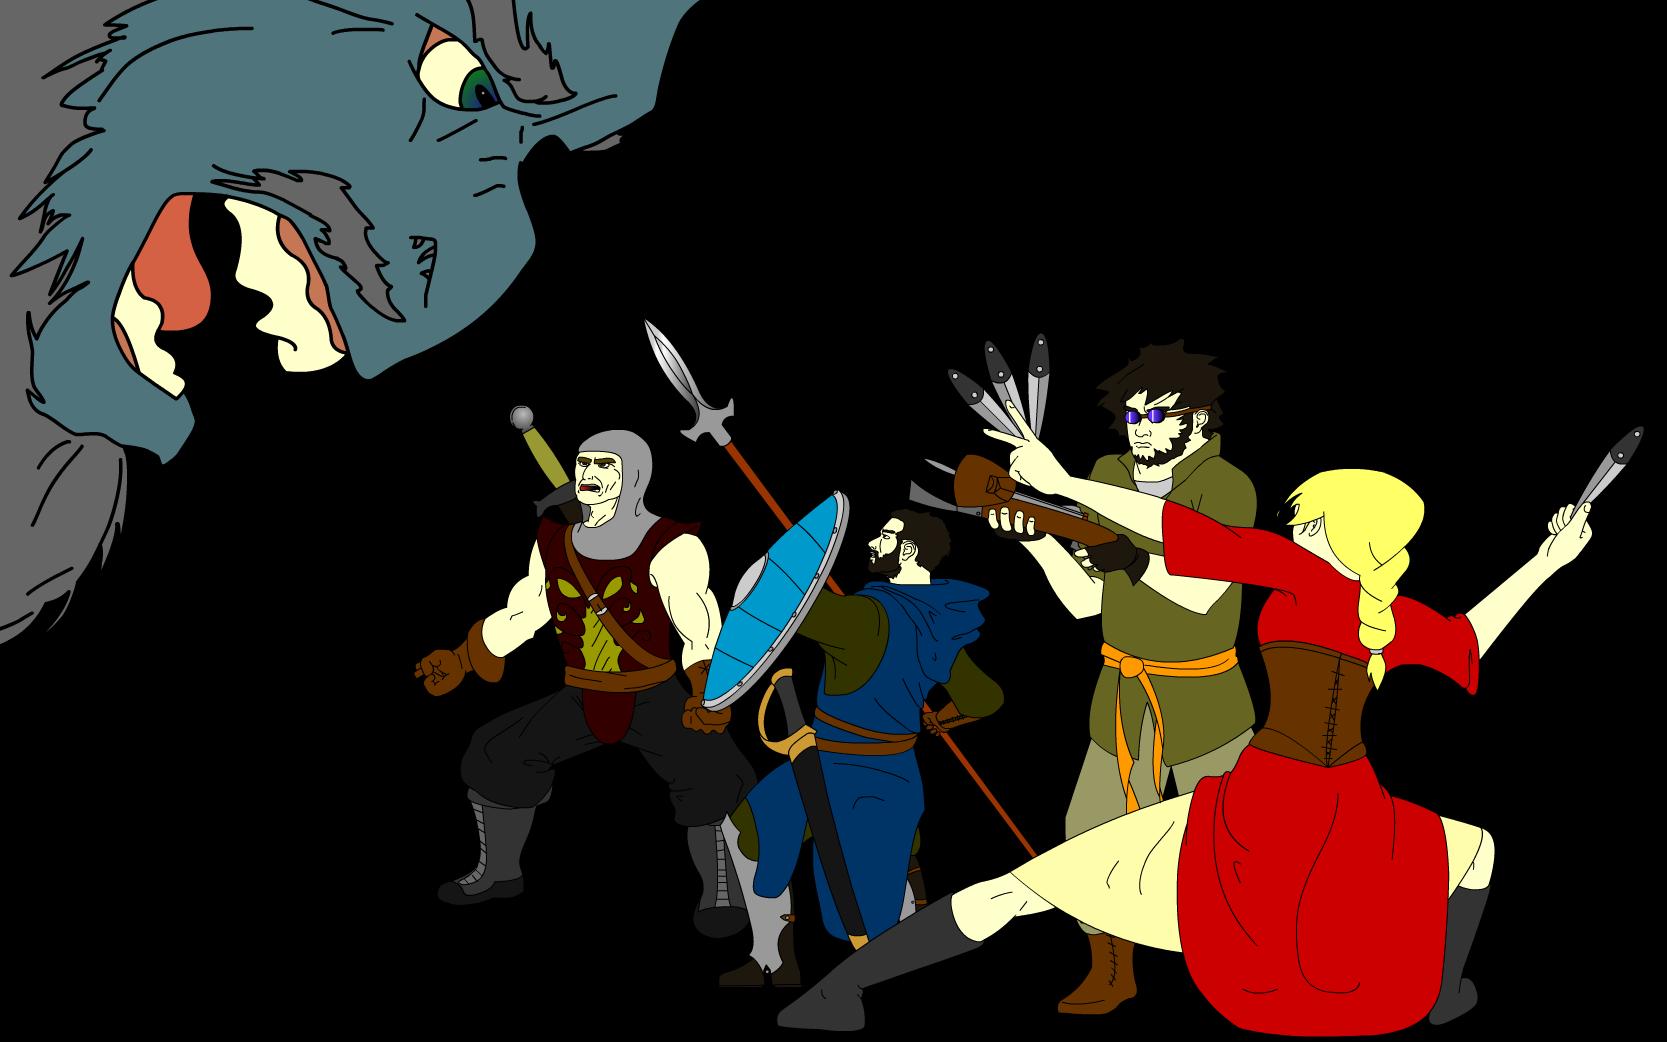 Adventurers vs a Giant Troll